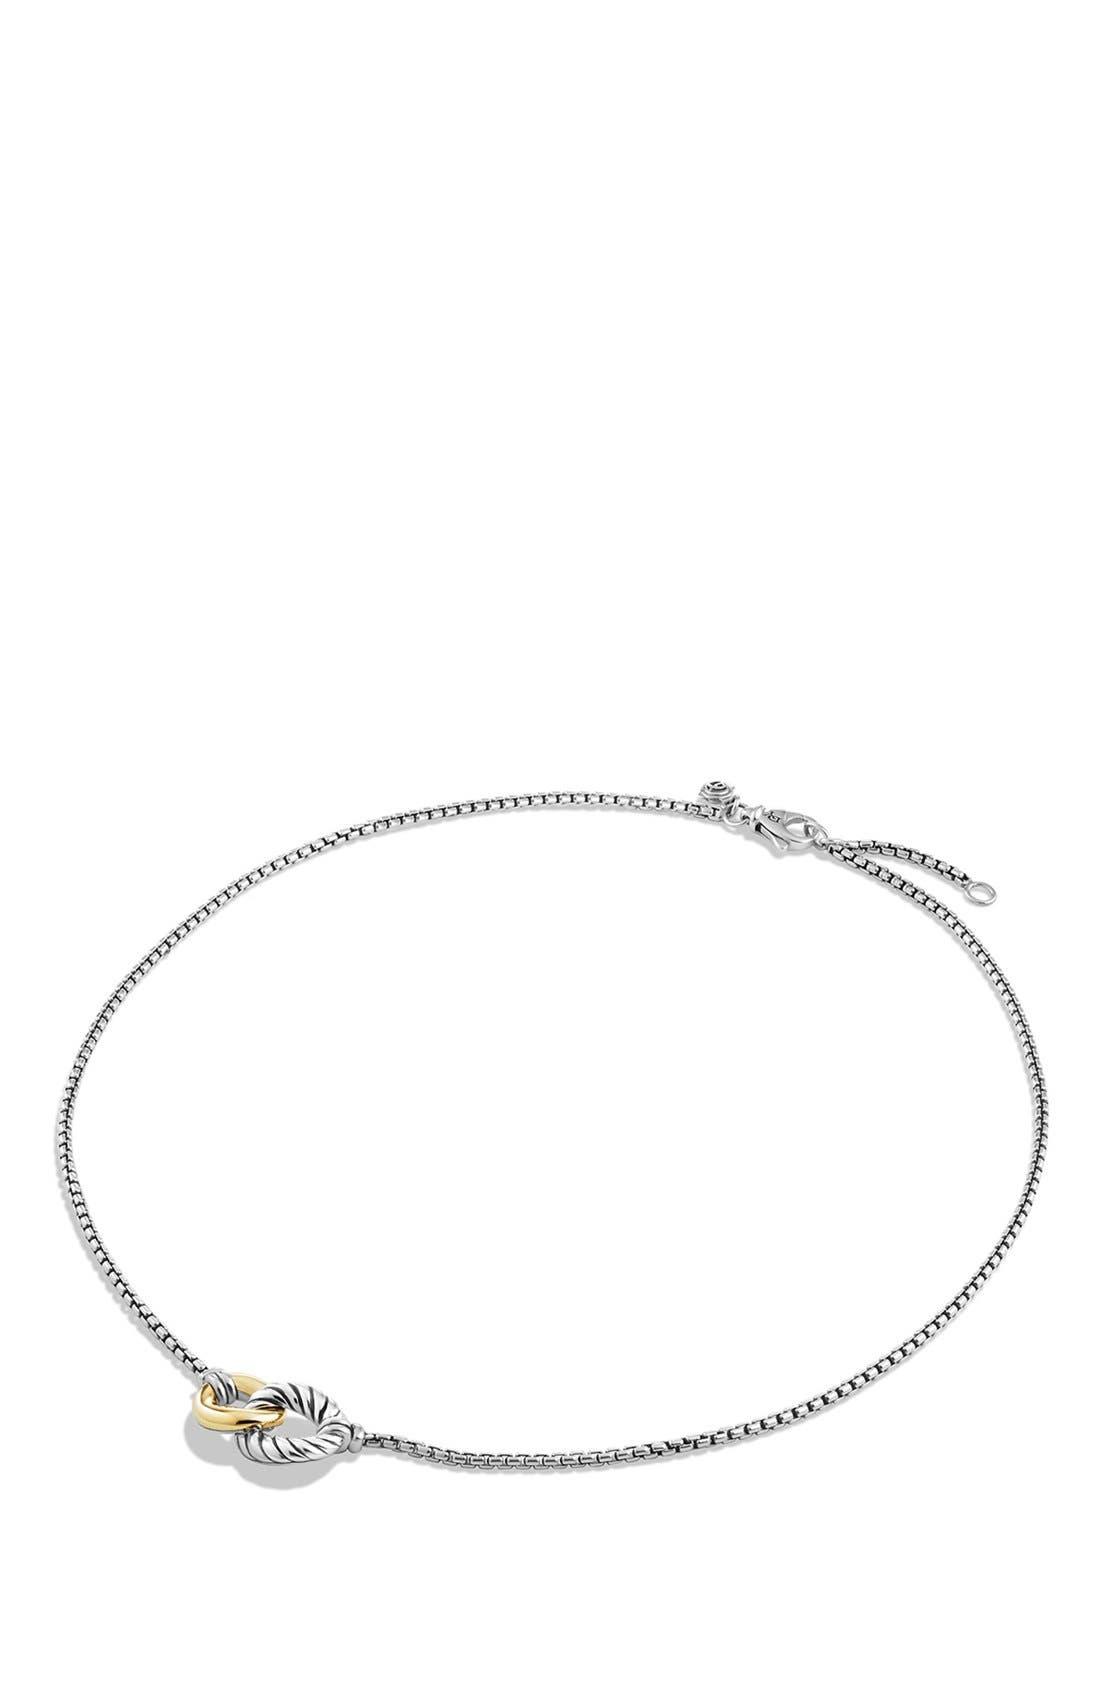 Alternate Image 2  - David Yurman'Belmont' Curb Link Necklace with 18K Gold